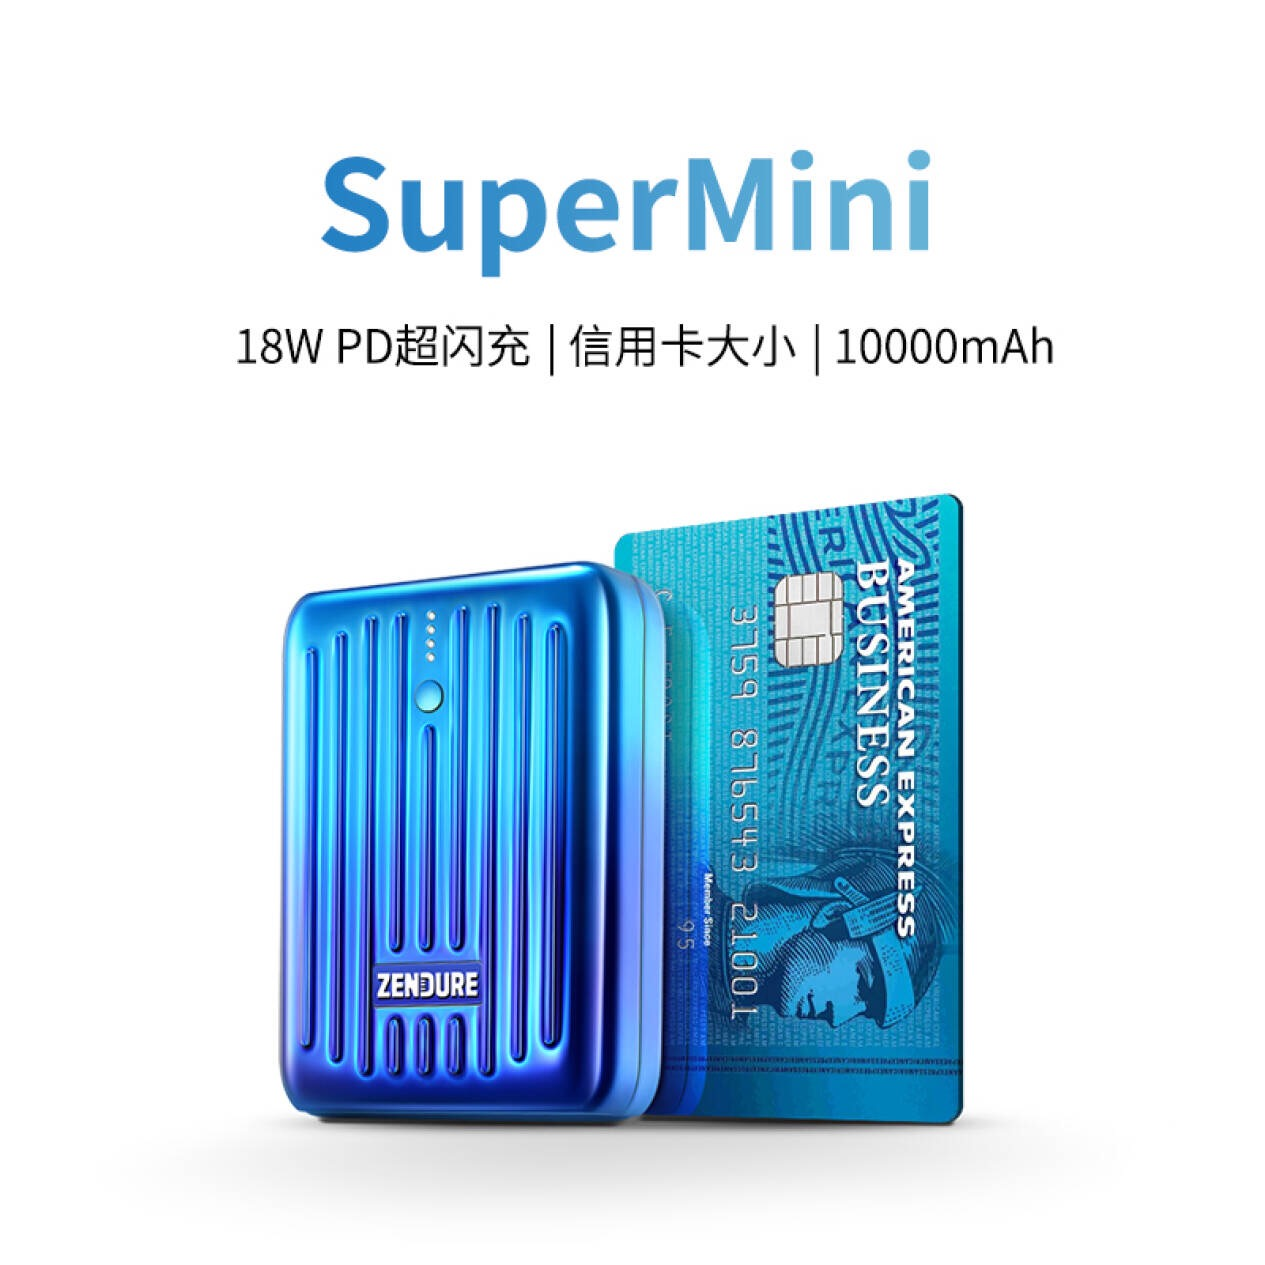 Zendure SuperMini充电宝超薄小巧10000毫安PD快充双向18W超闪充